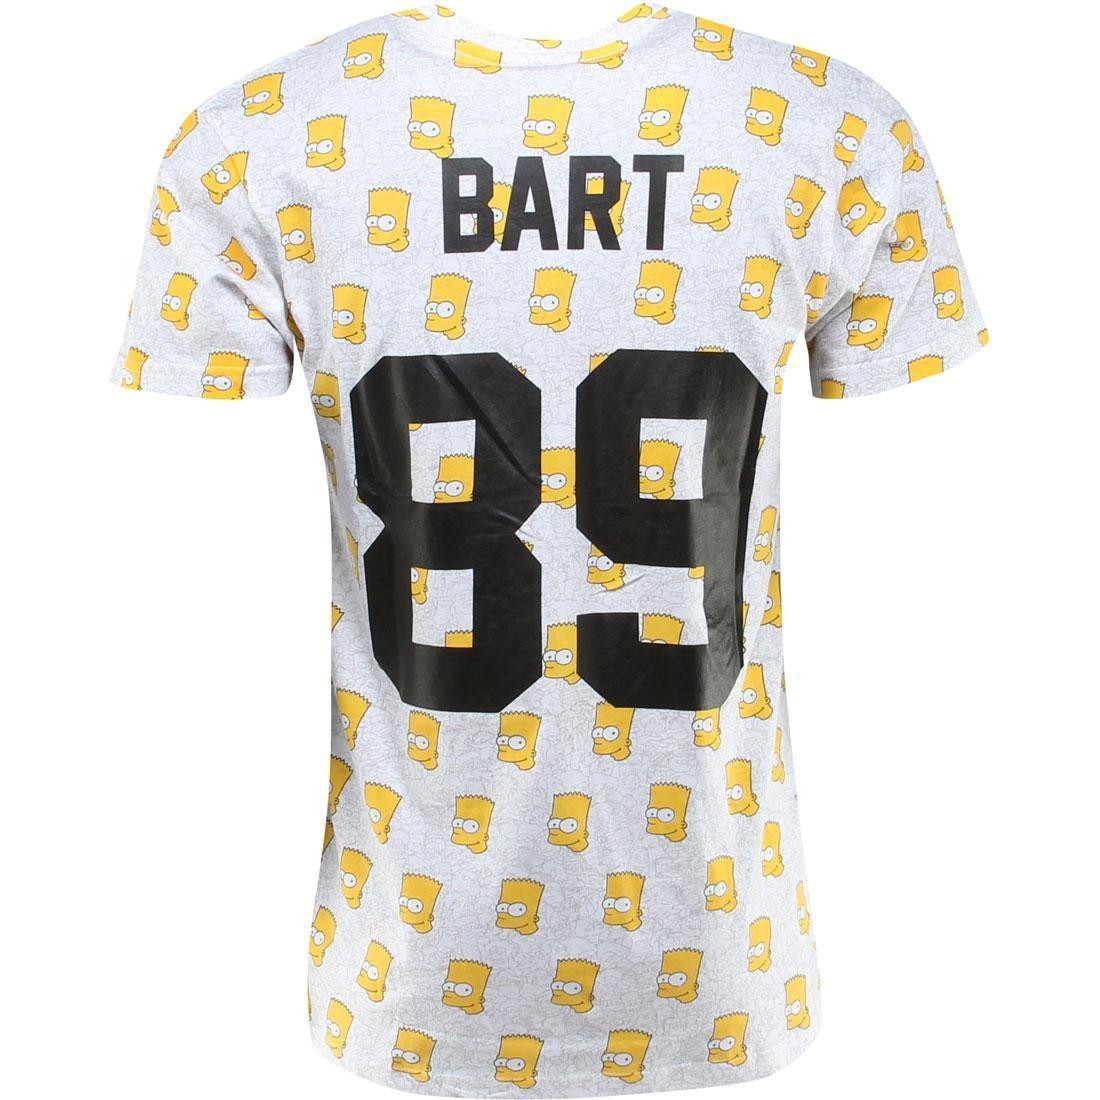 Tシャツ メンズファッション トップス カットソー メンズ 【 Eleven Paris X The Simpsons Hart M Tee (white / Olhart Print) 】 White / Olhart Print